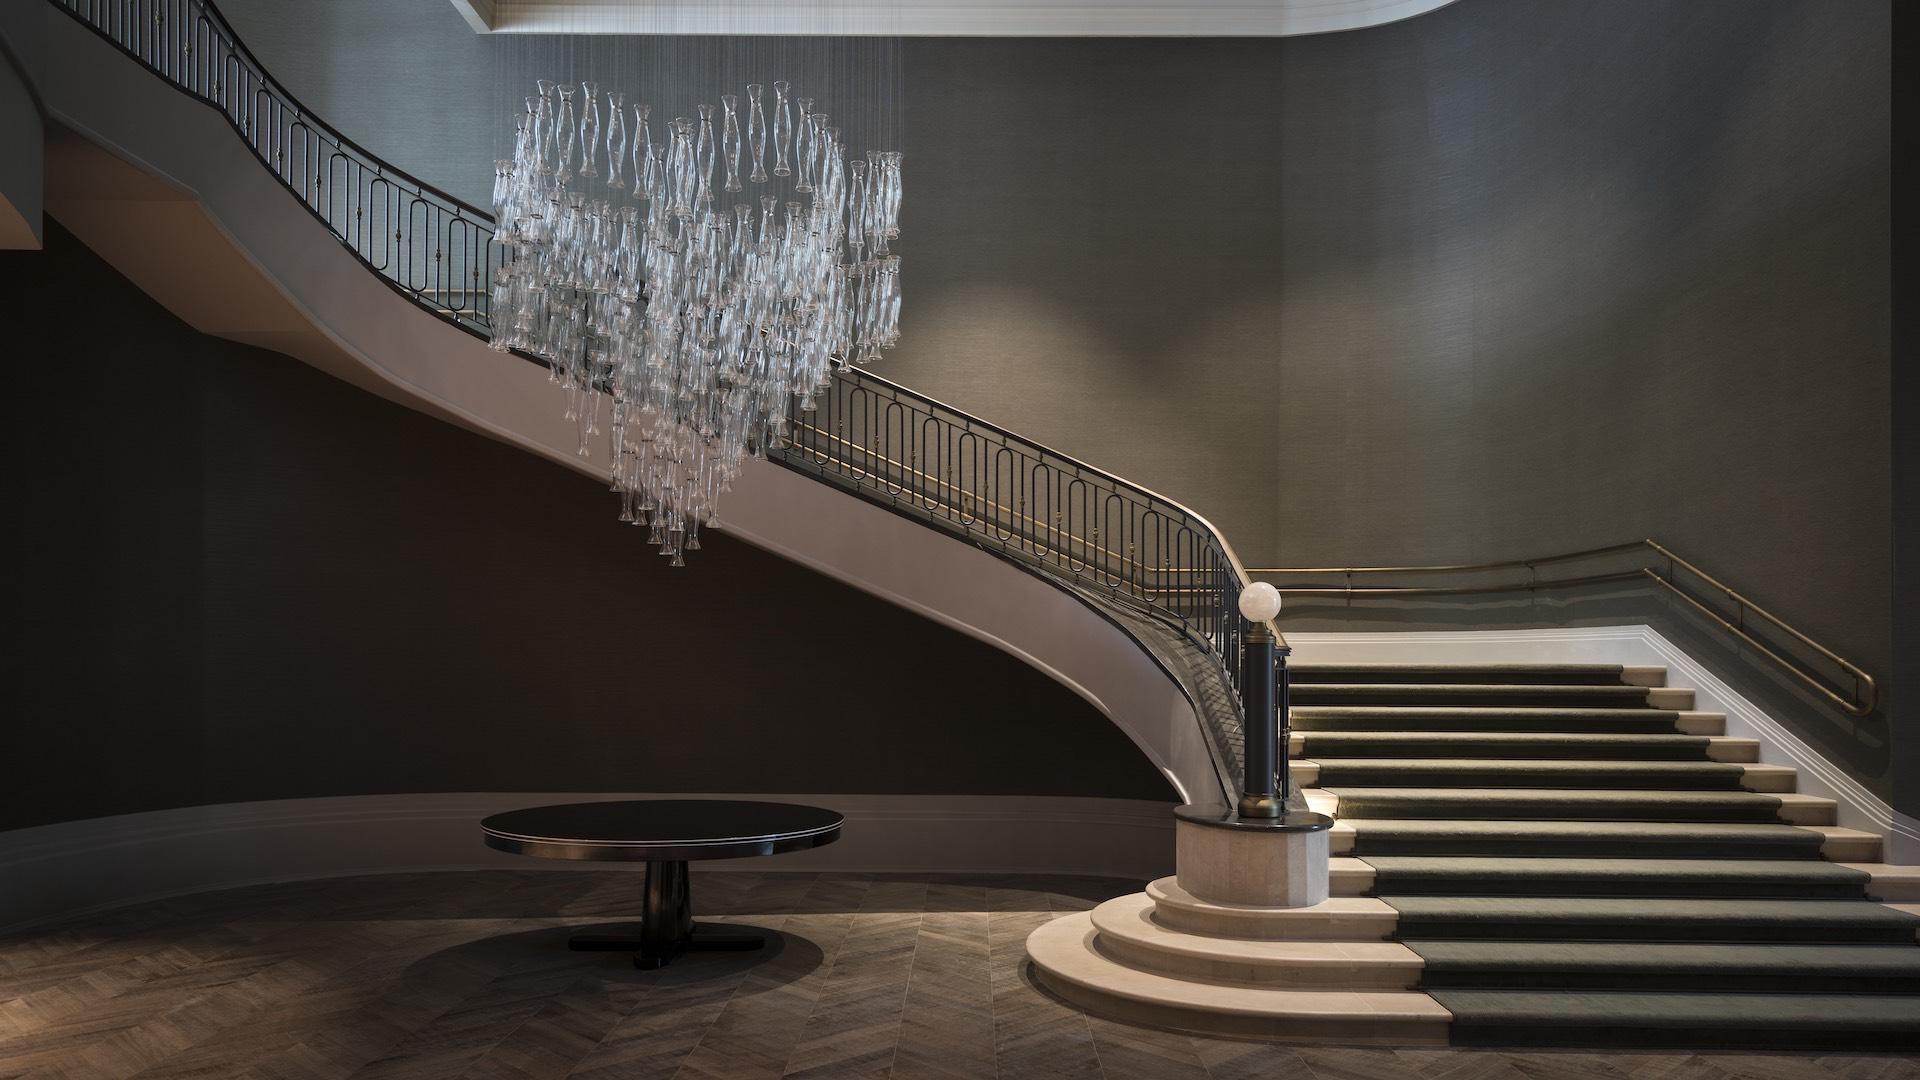 Cristal_Ballroom_Stairs__6715.jpg